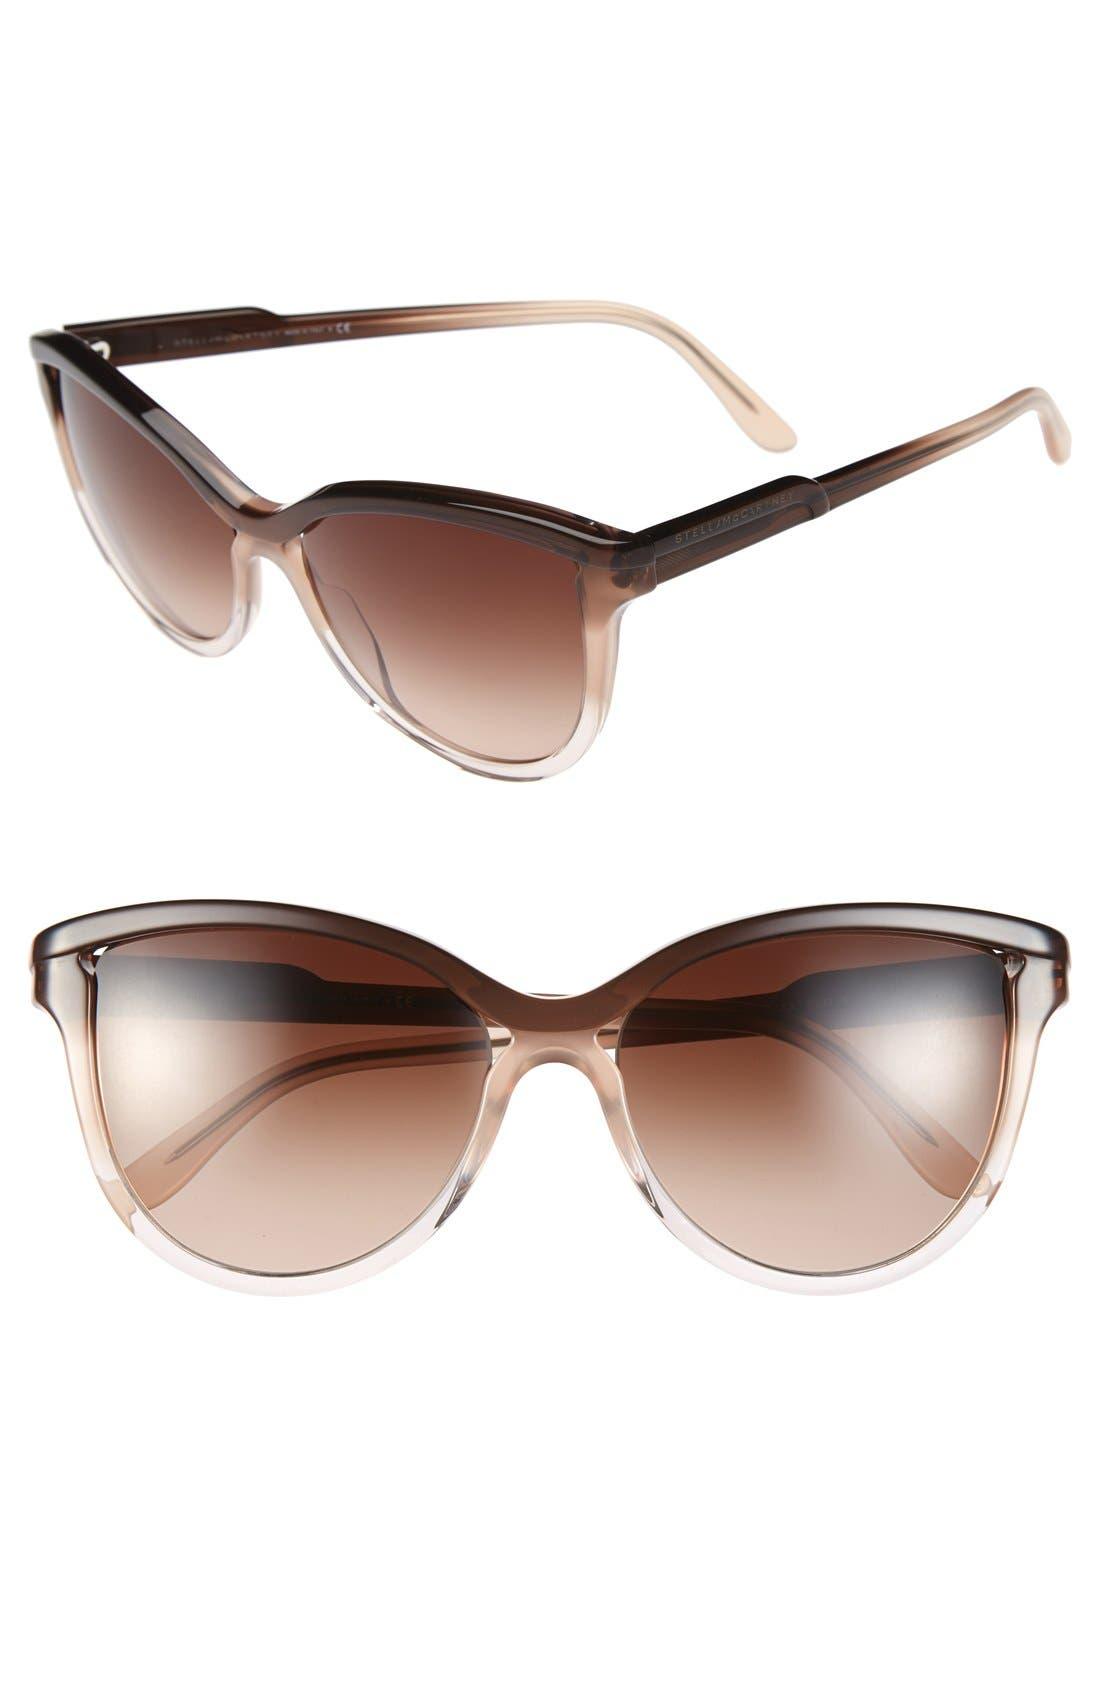 Main Image - Stella McCartney 58mm Retro Sunglasses